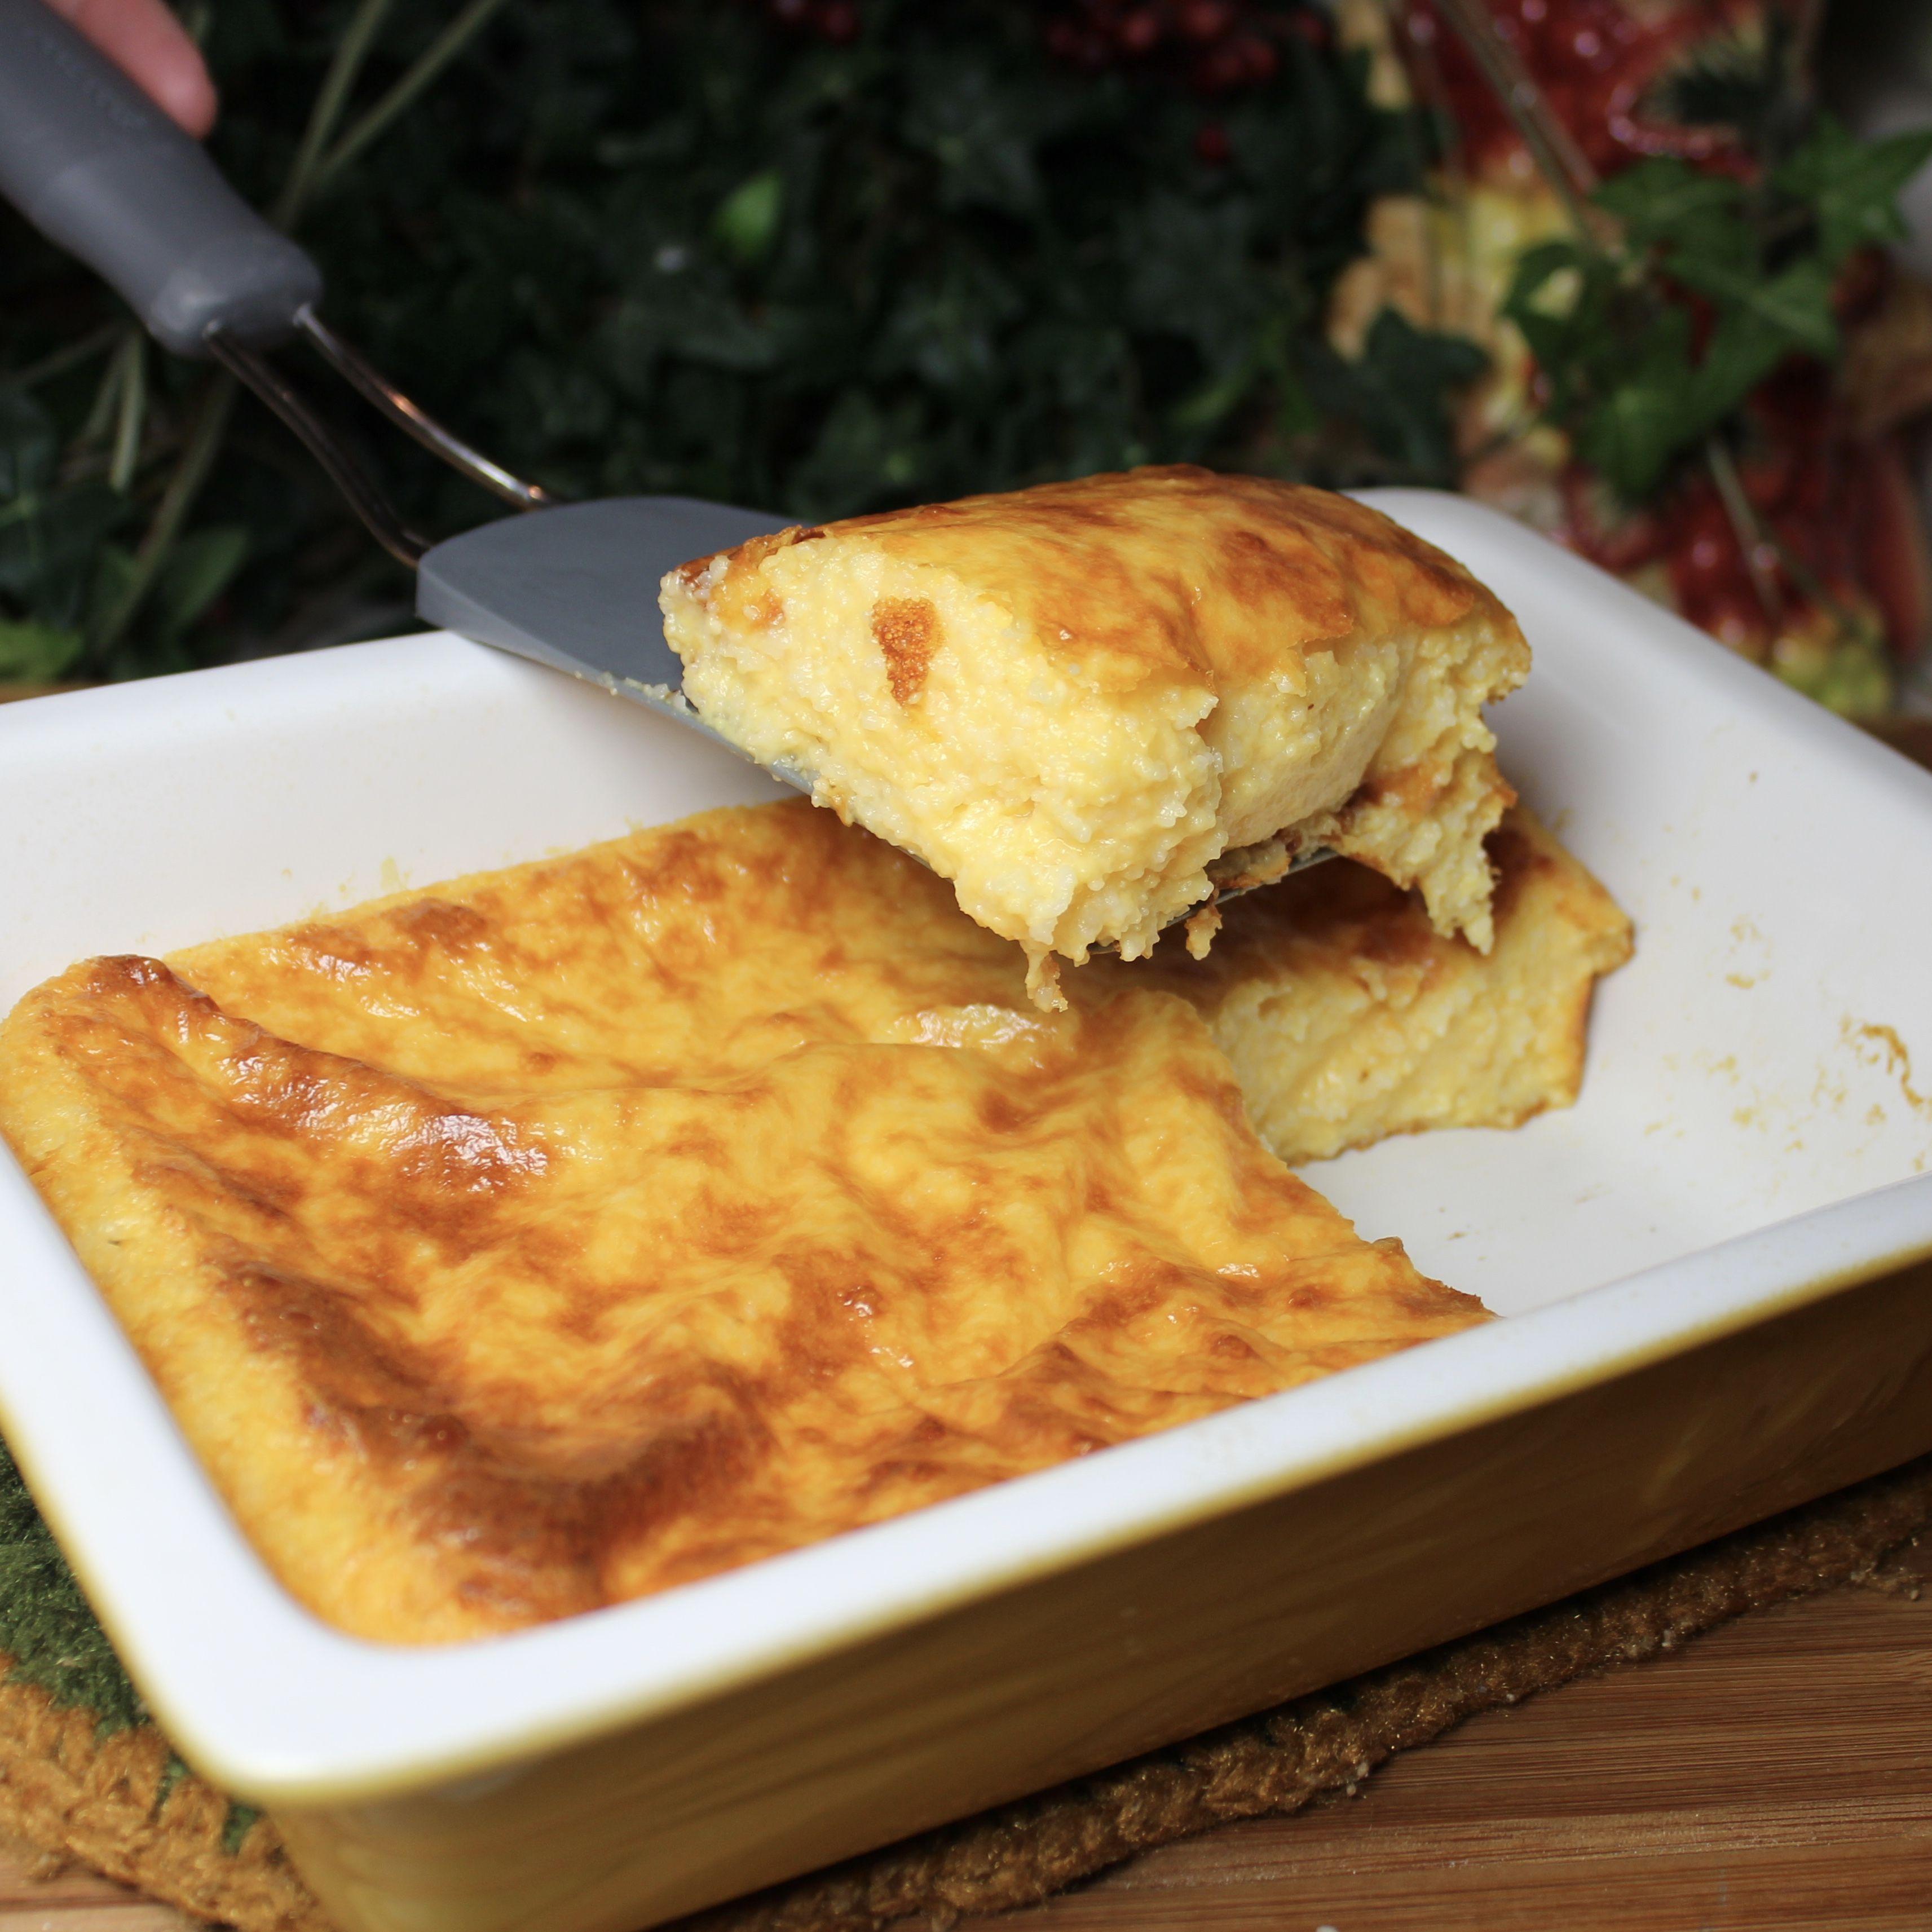 Cheese Grits Casserole #MyAllrecipes #AllrecipesAllstars #AllrecipesFaceless